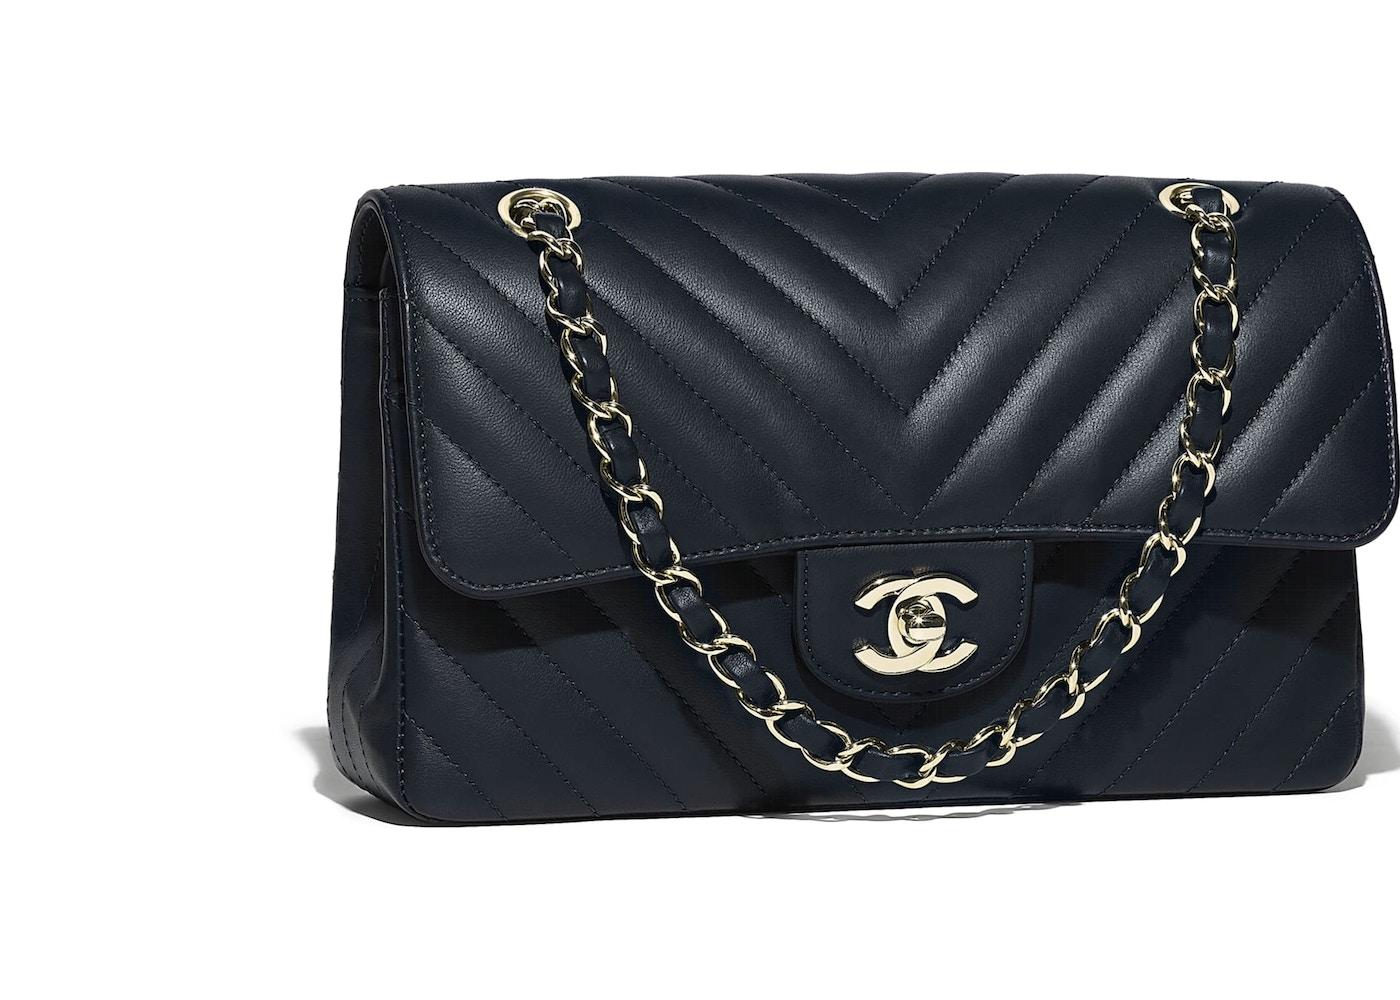 9d3e15709ad3 Chanel Classic Handbag Chevron Lambskin Gold-tone Small Navy Blue